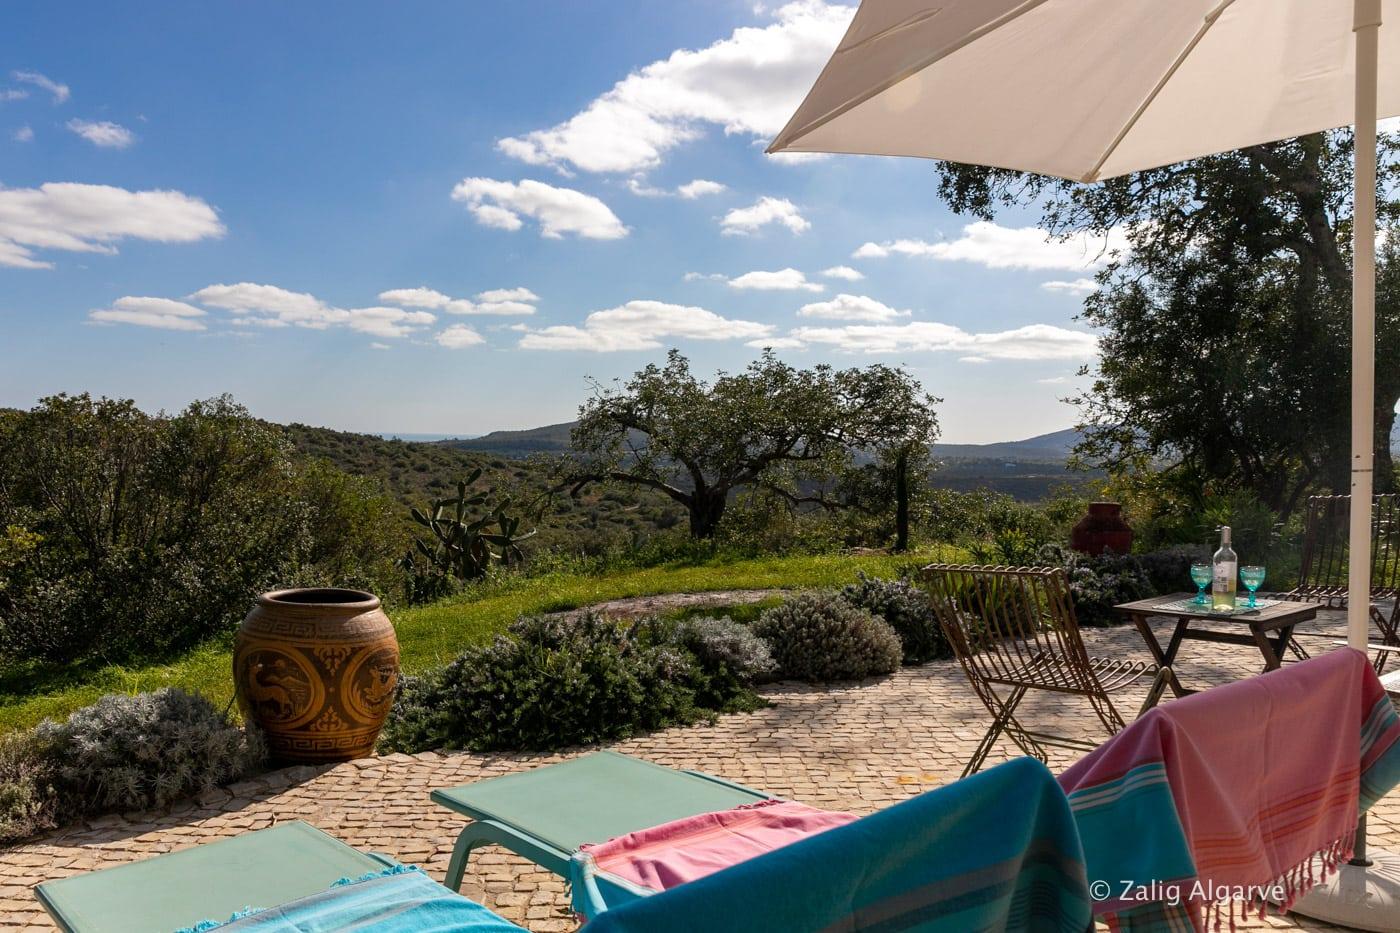 Casa-Alfarrobeira-Zalig-Algarve-48